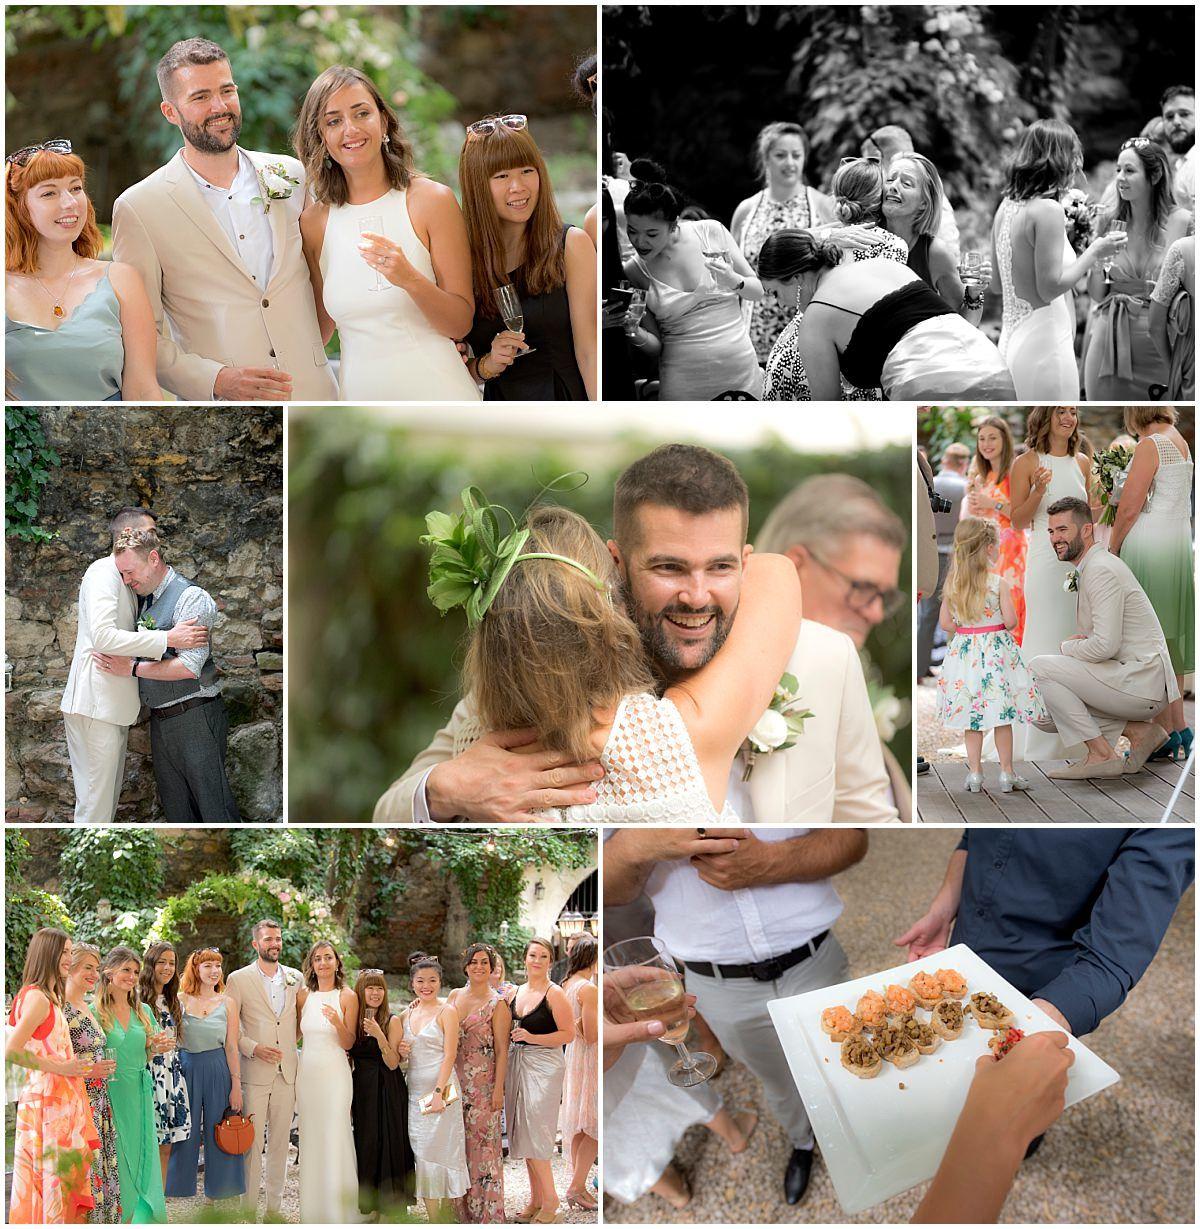 candids of wedding guests